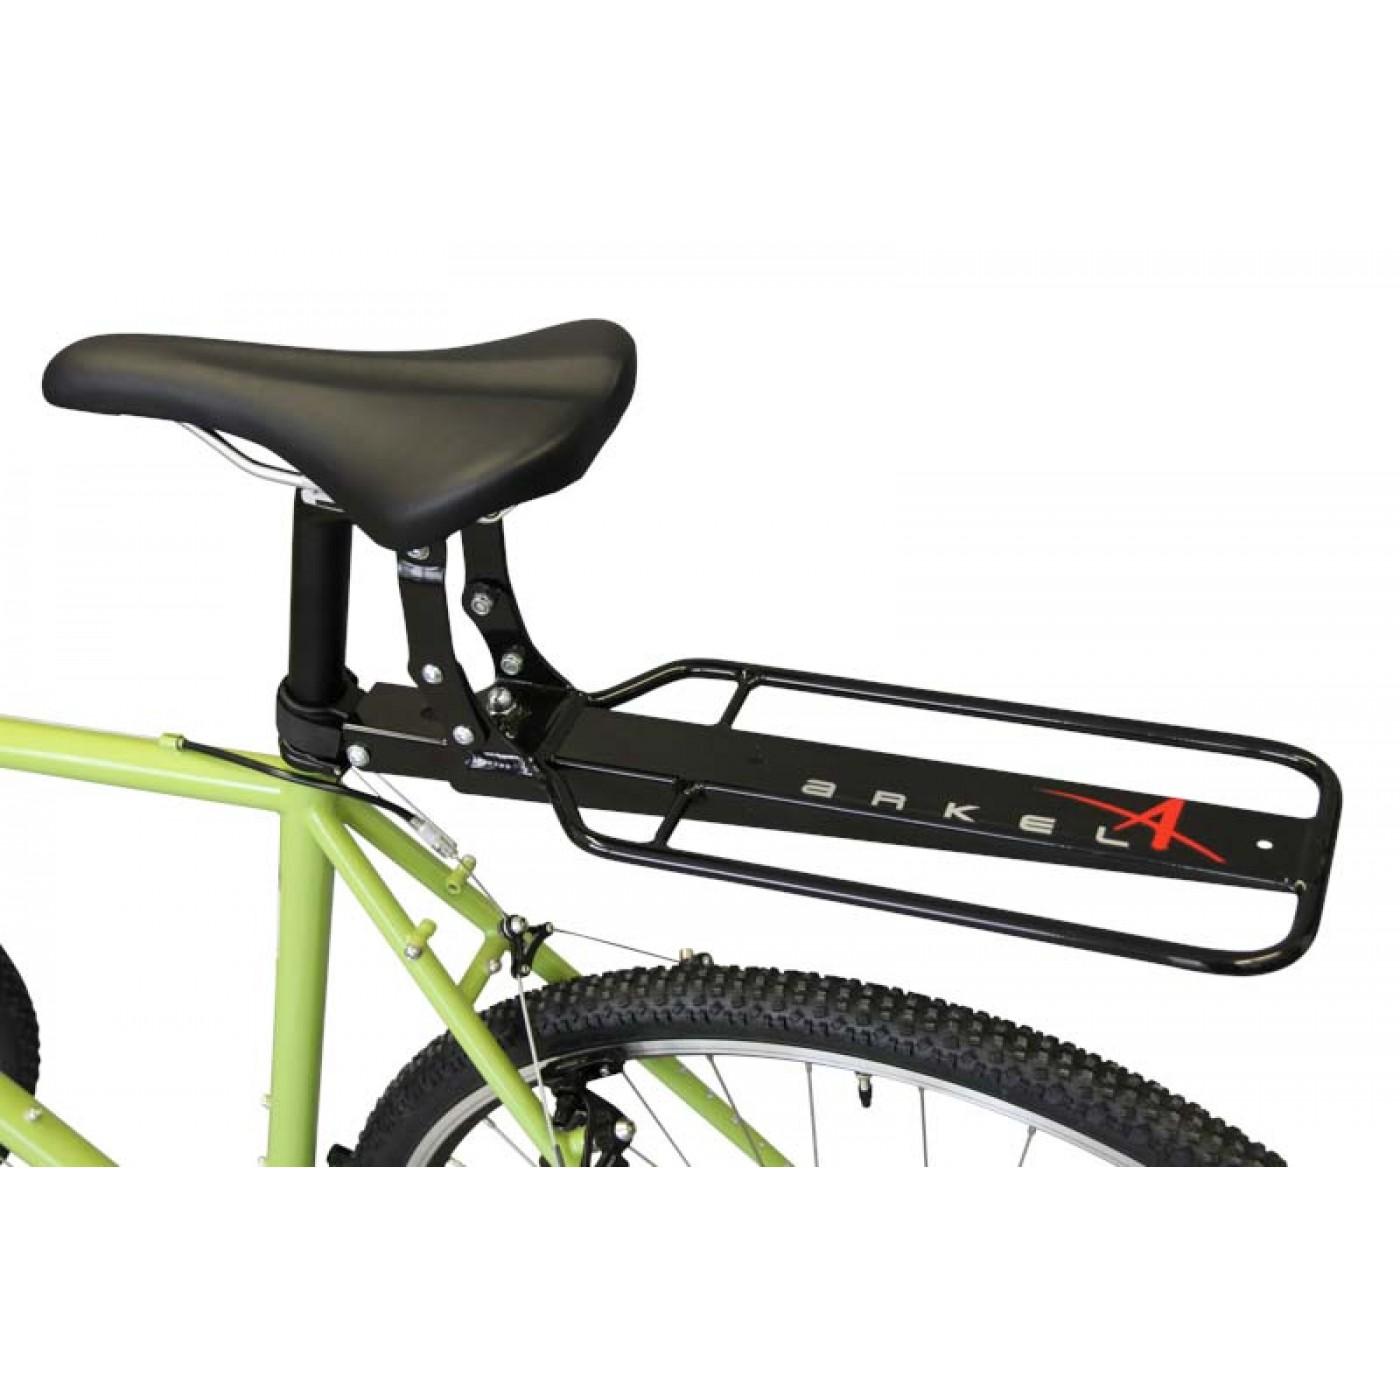 Transit Bike Racks | Sportworks